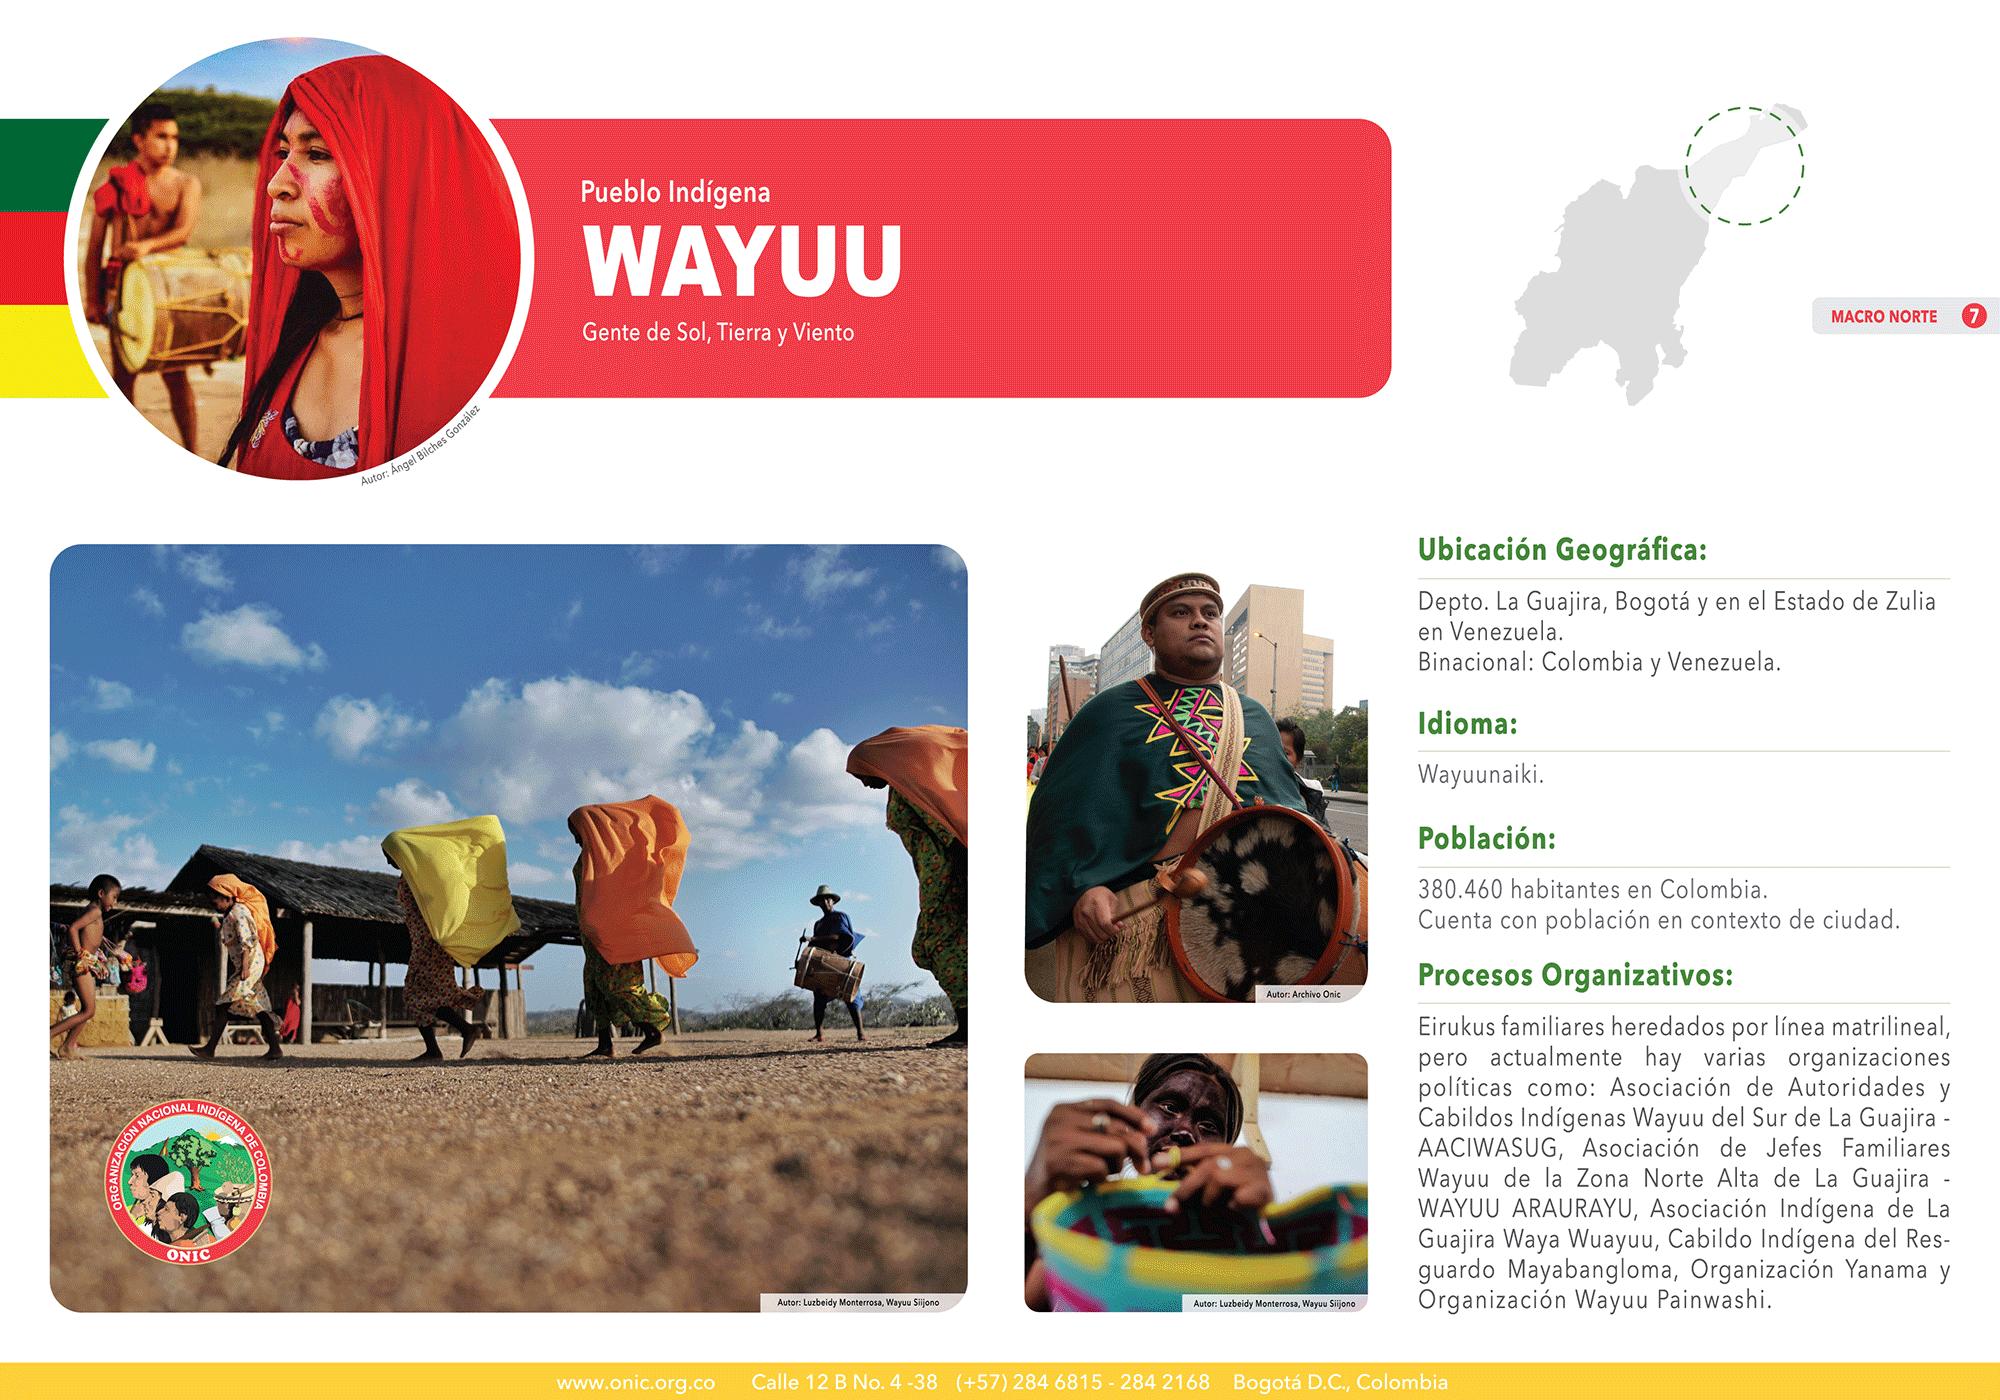 7-WAYUU-FichaDigital-PueblosIndígenas-ONIC-01